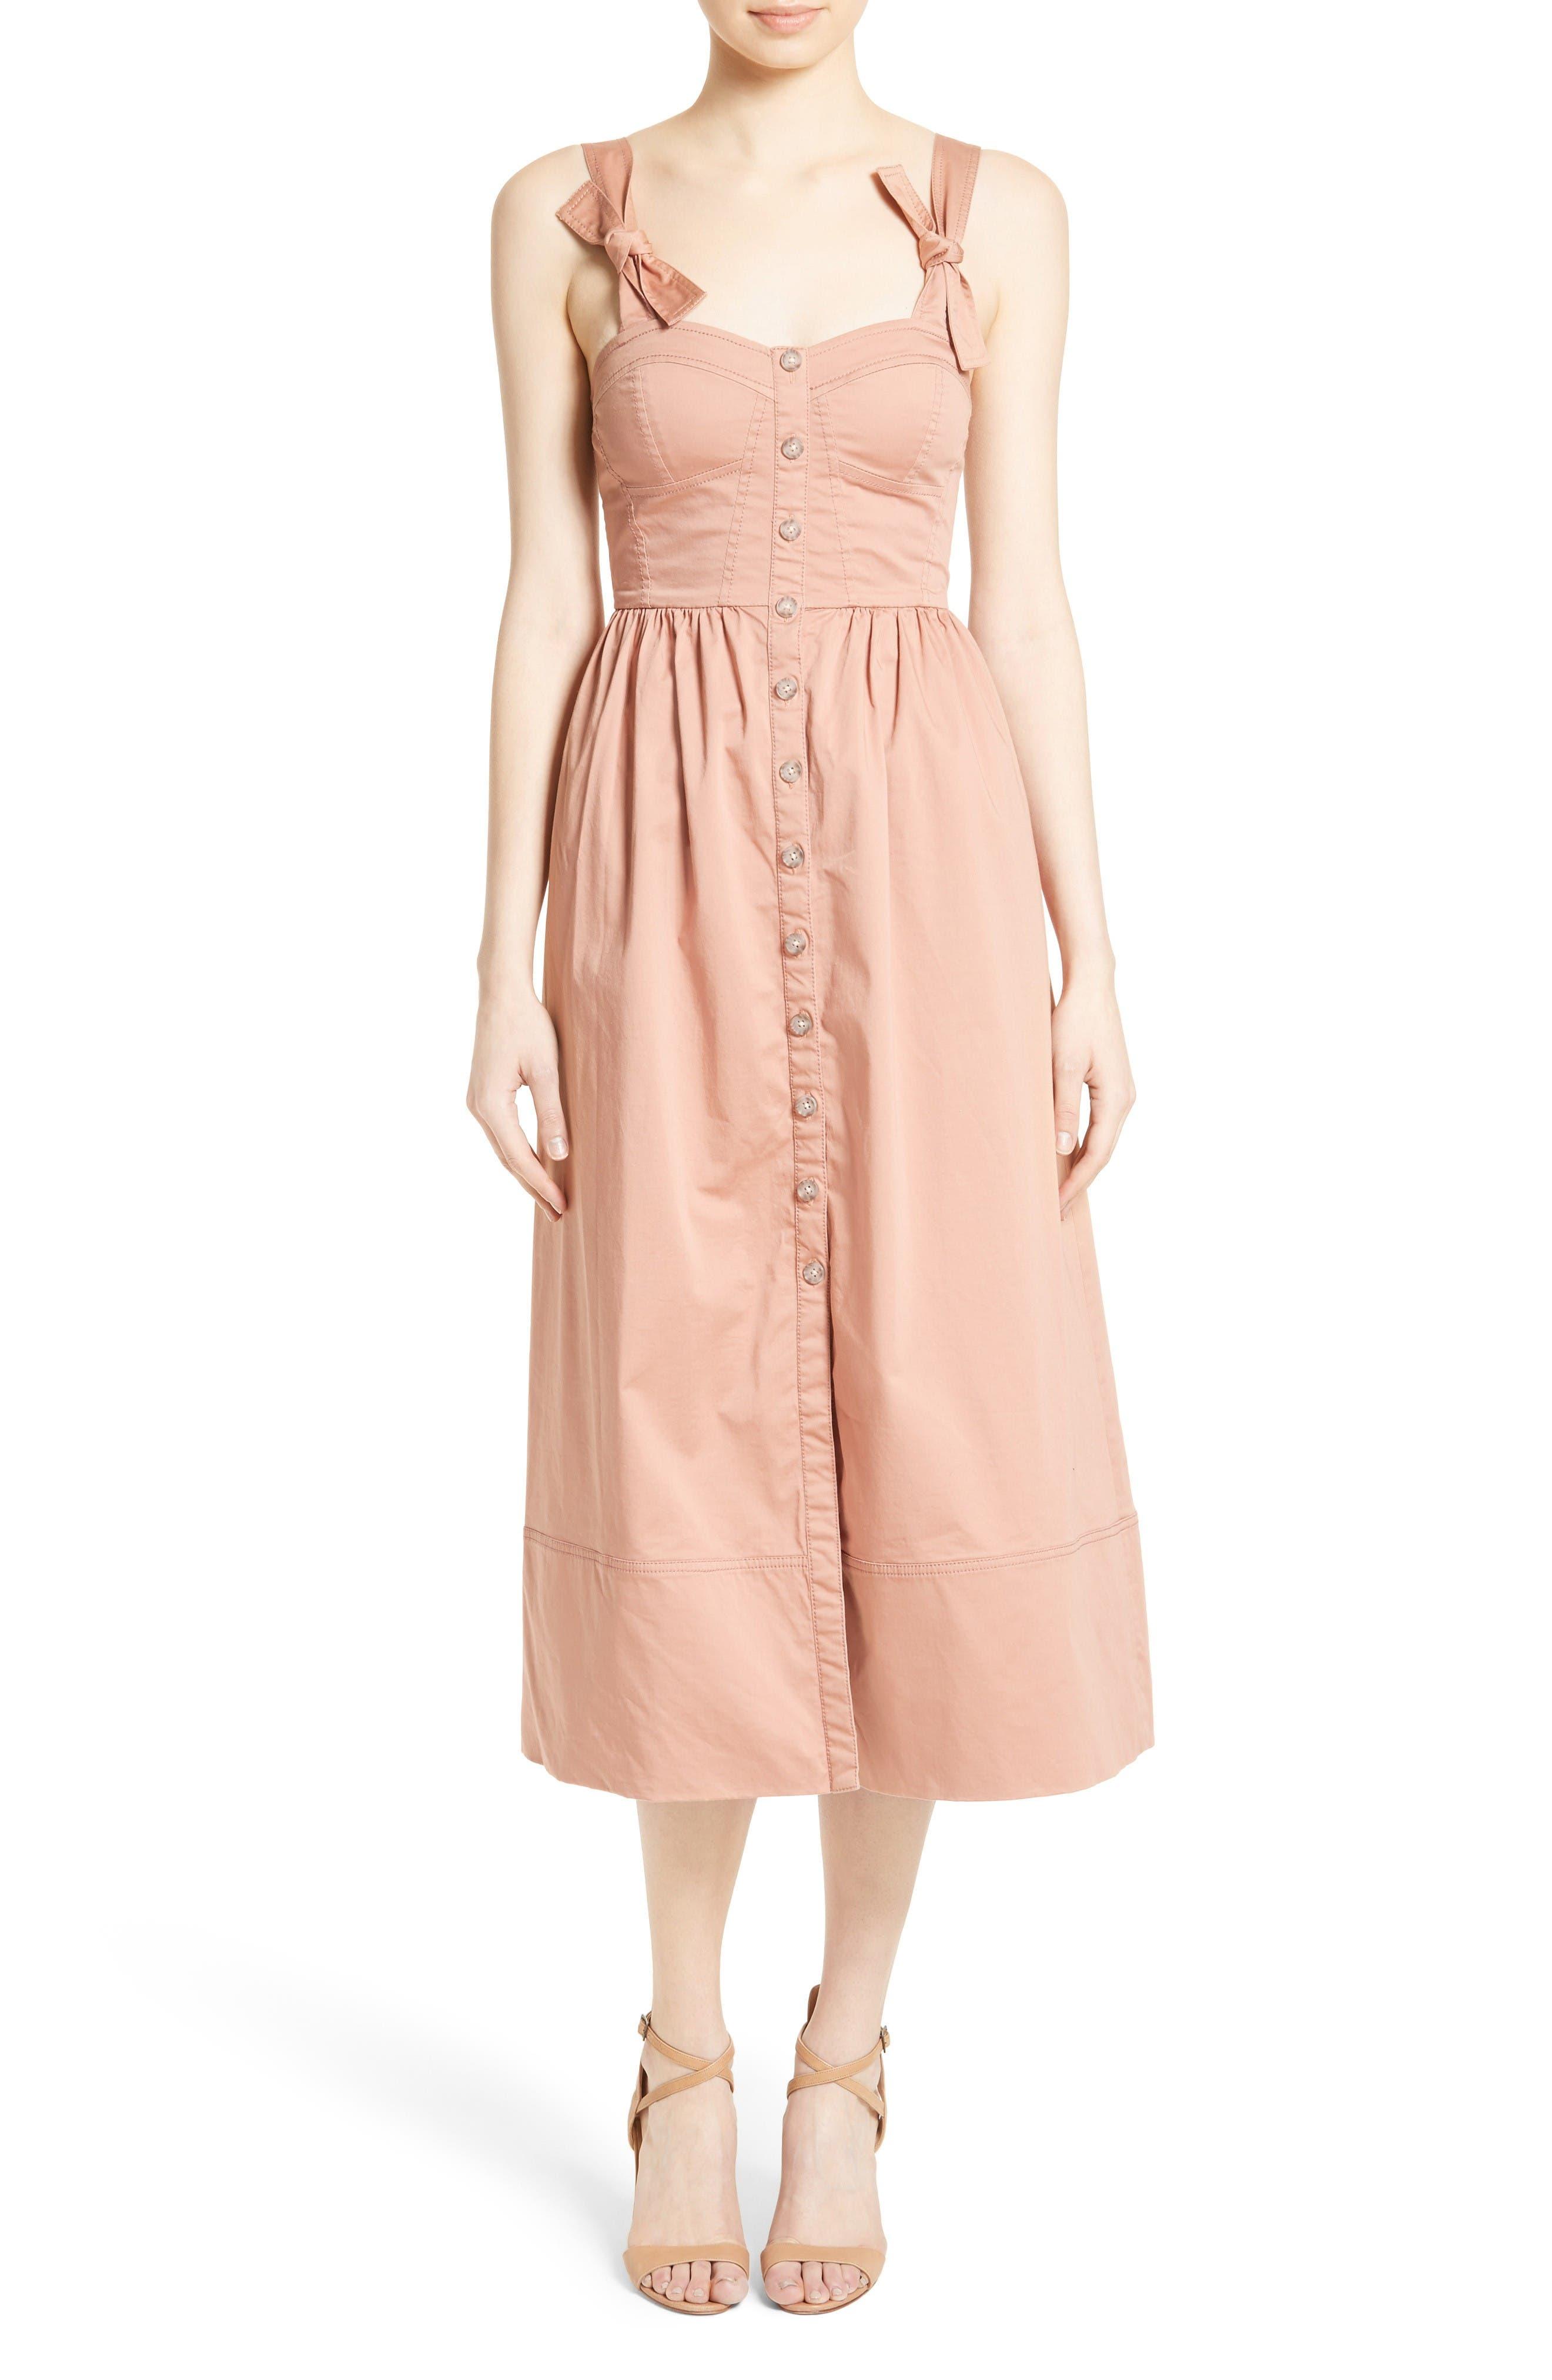 Alternate Image 1 Selected - Rebecca Taylor Stretch Cotton Midi Dress